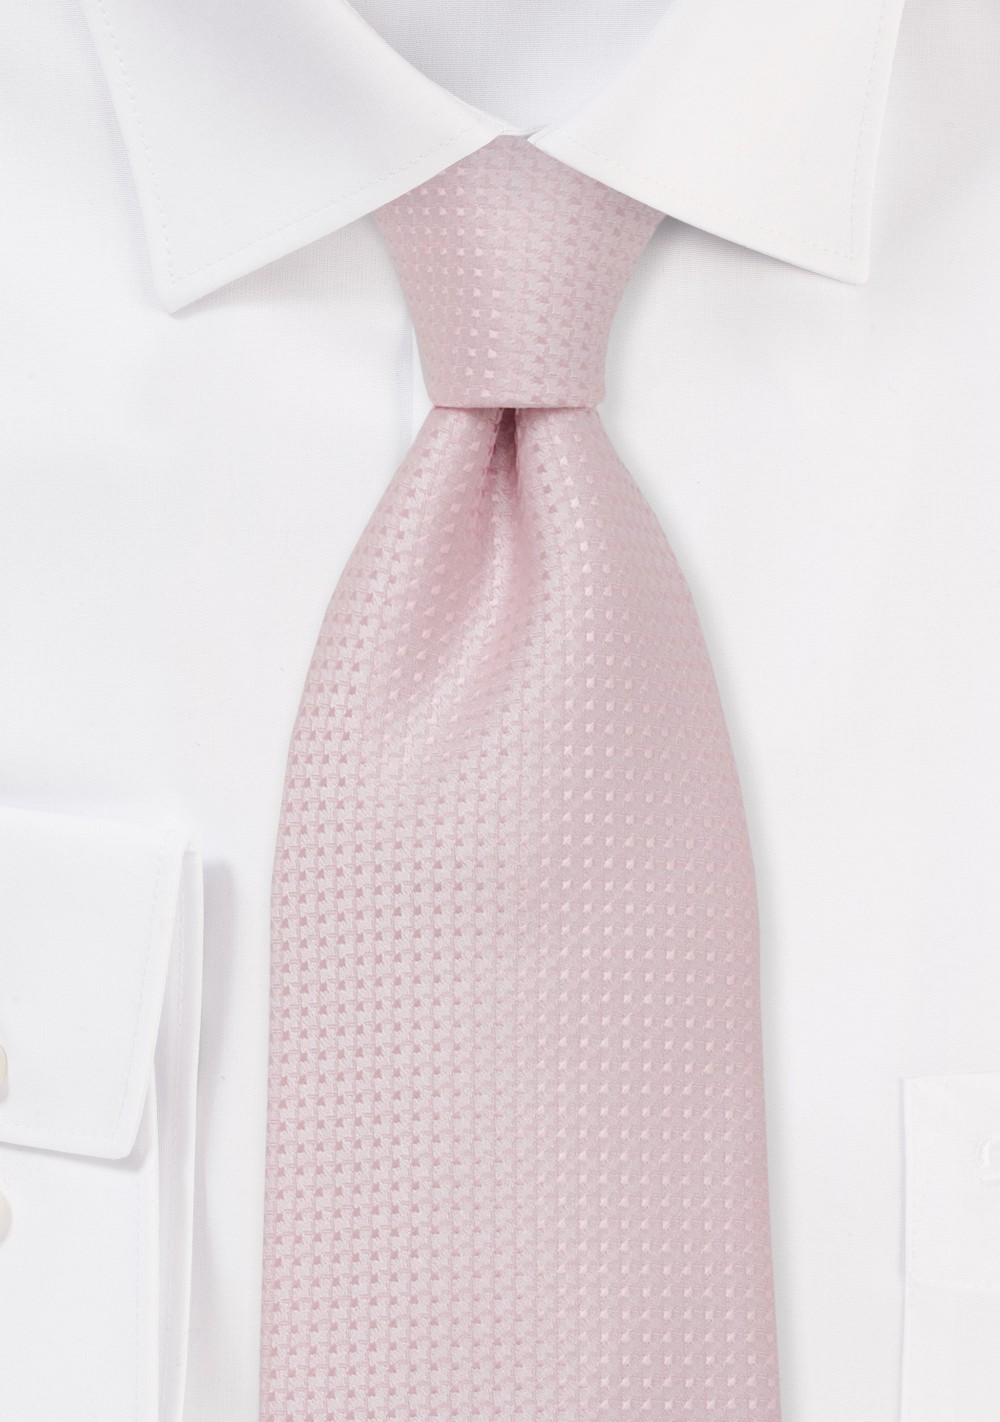 Pink Silk Tie - Handmade silk tie in light pink